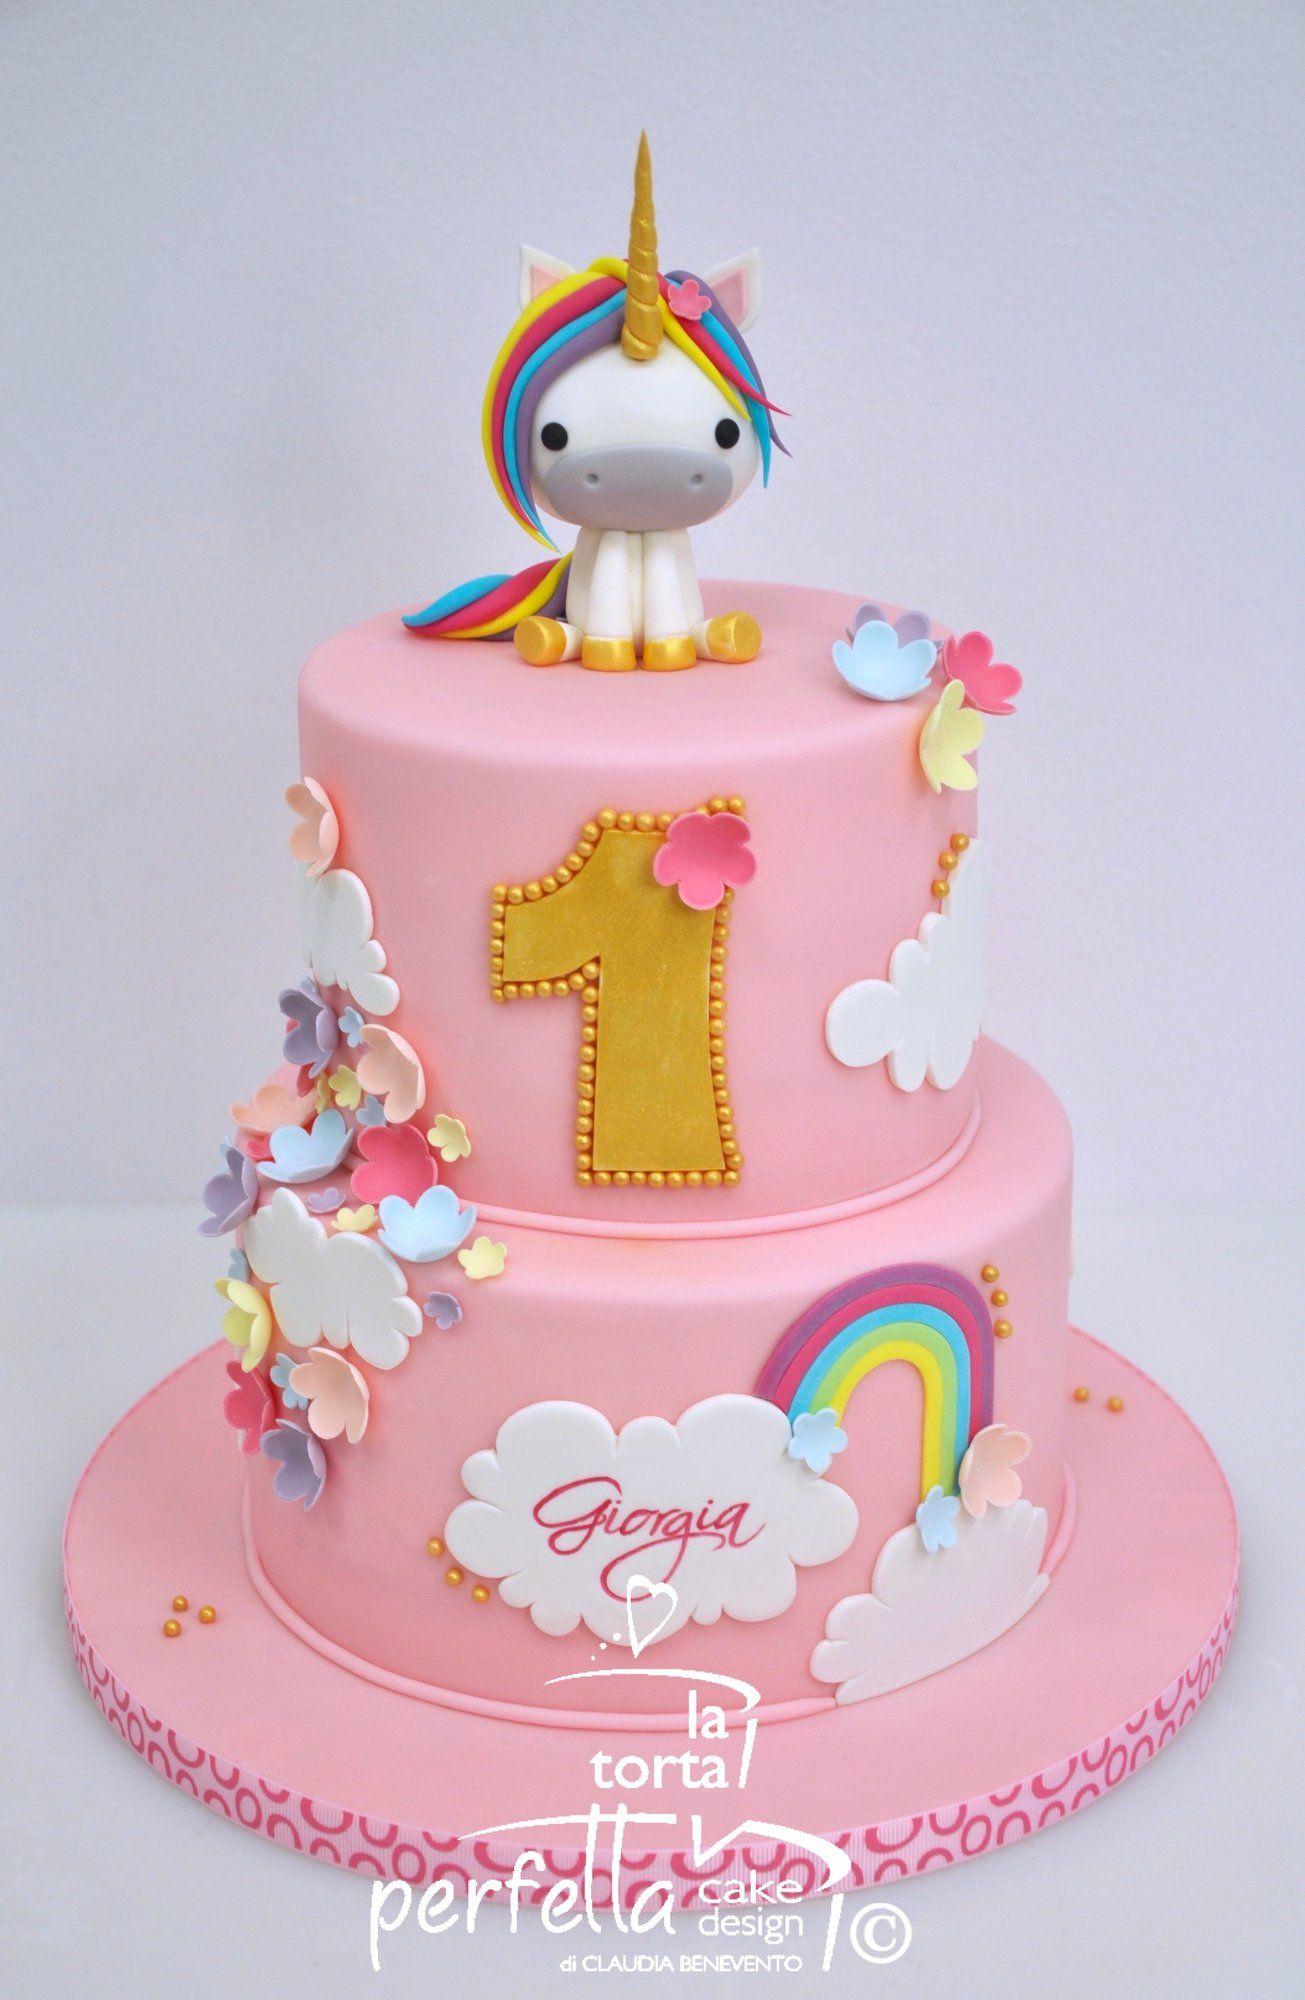 Cute First Birthday Cake With Unicorn Cake Topper Unicorn Birthday Cake Birthday Cake Kids First Birthday Cakes